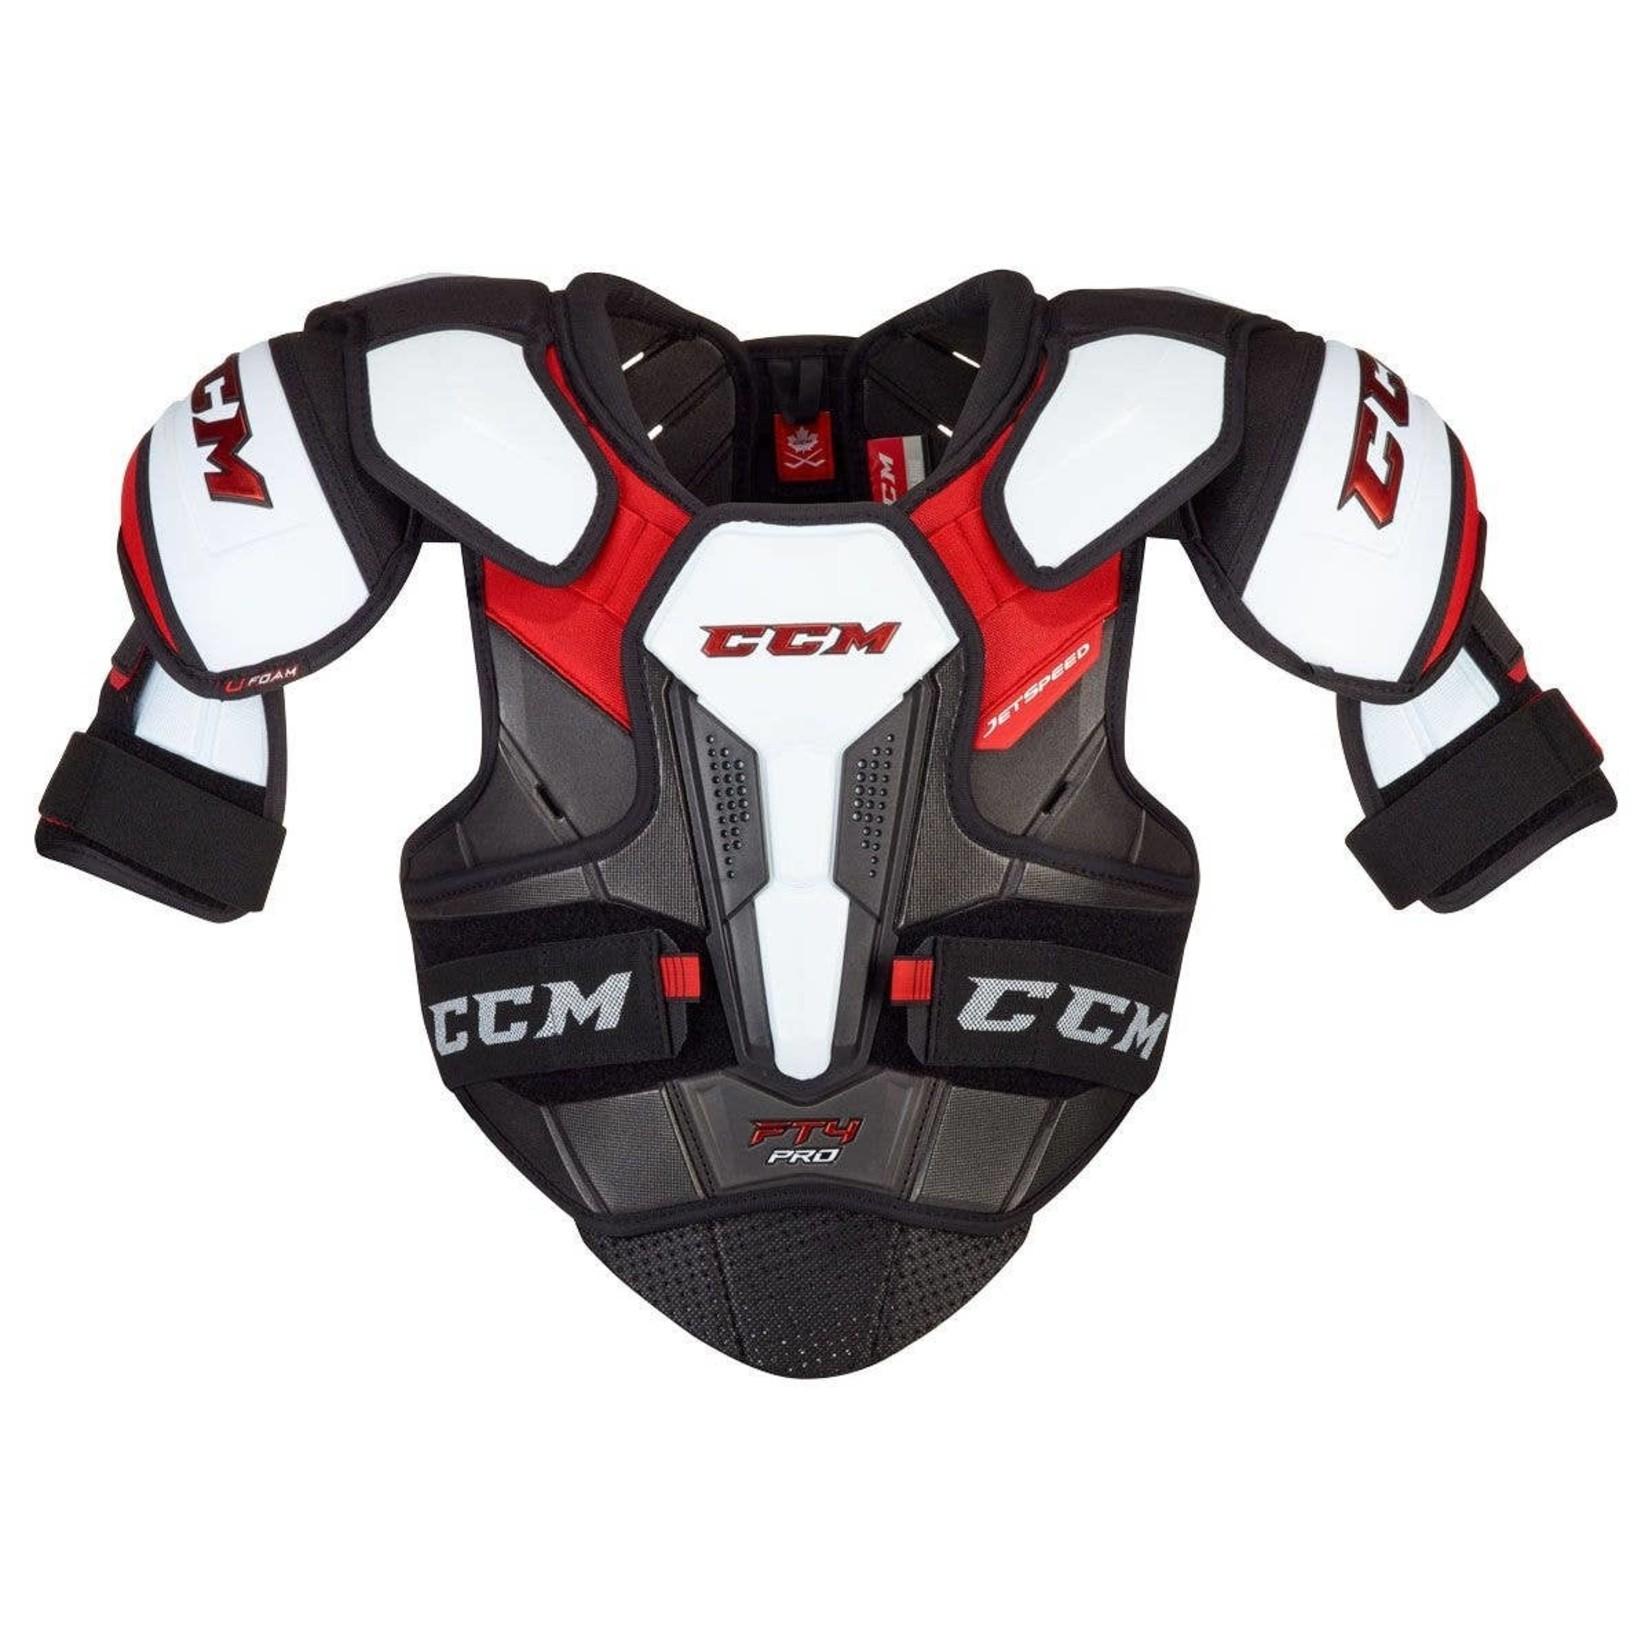 CCM CCM Hockey Shoulder Pads, Jetspeed FT4 Pro, Senior